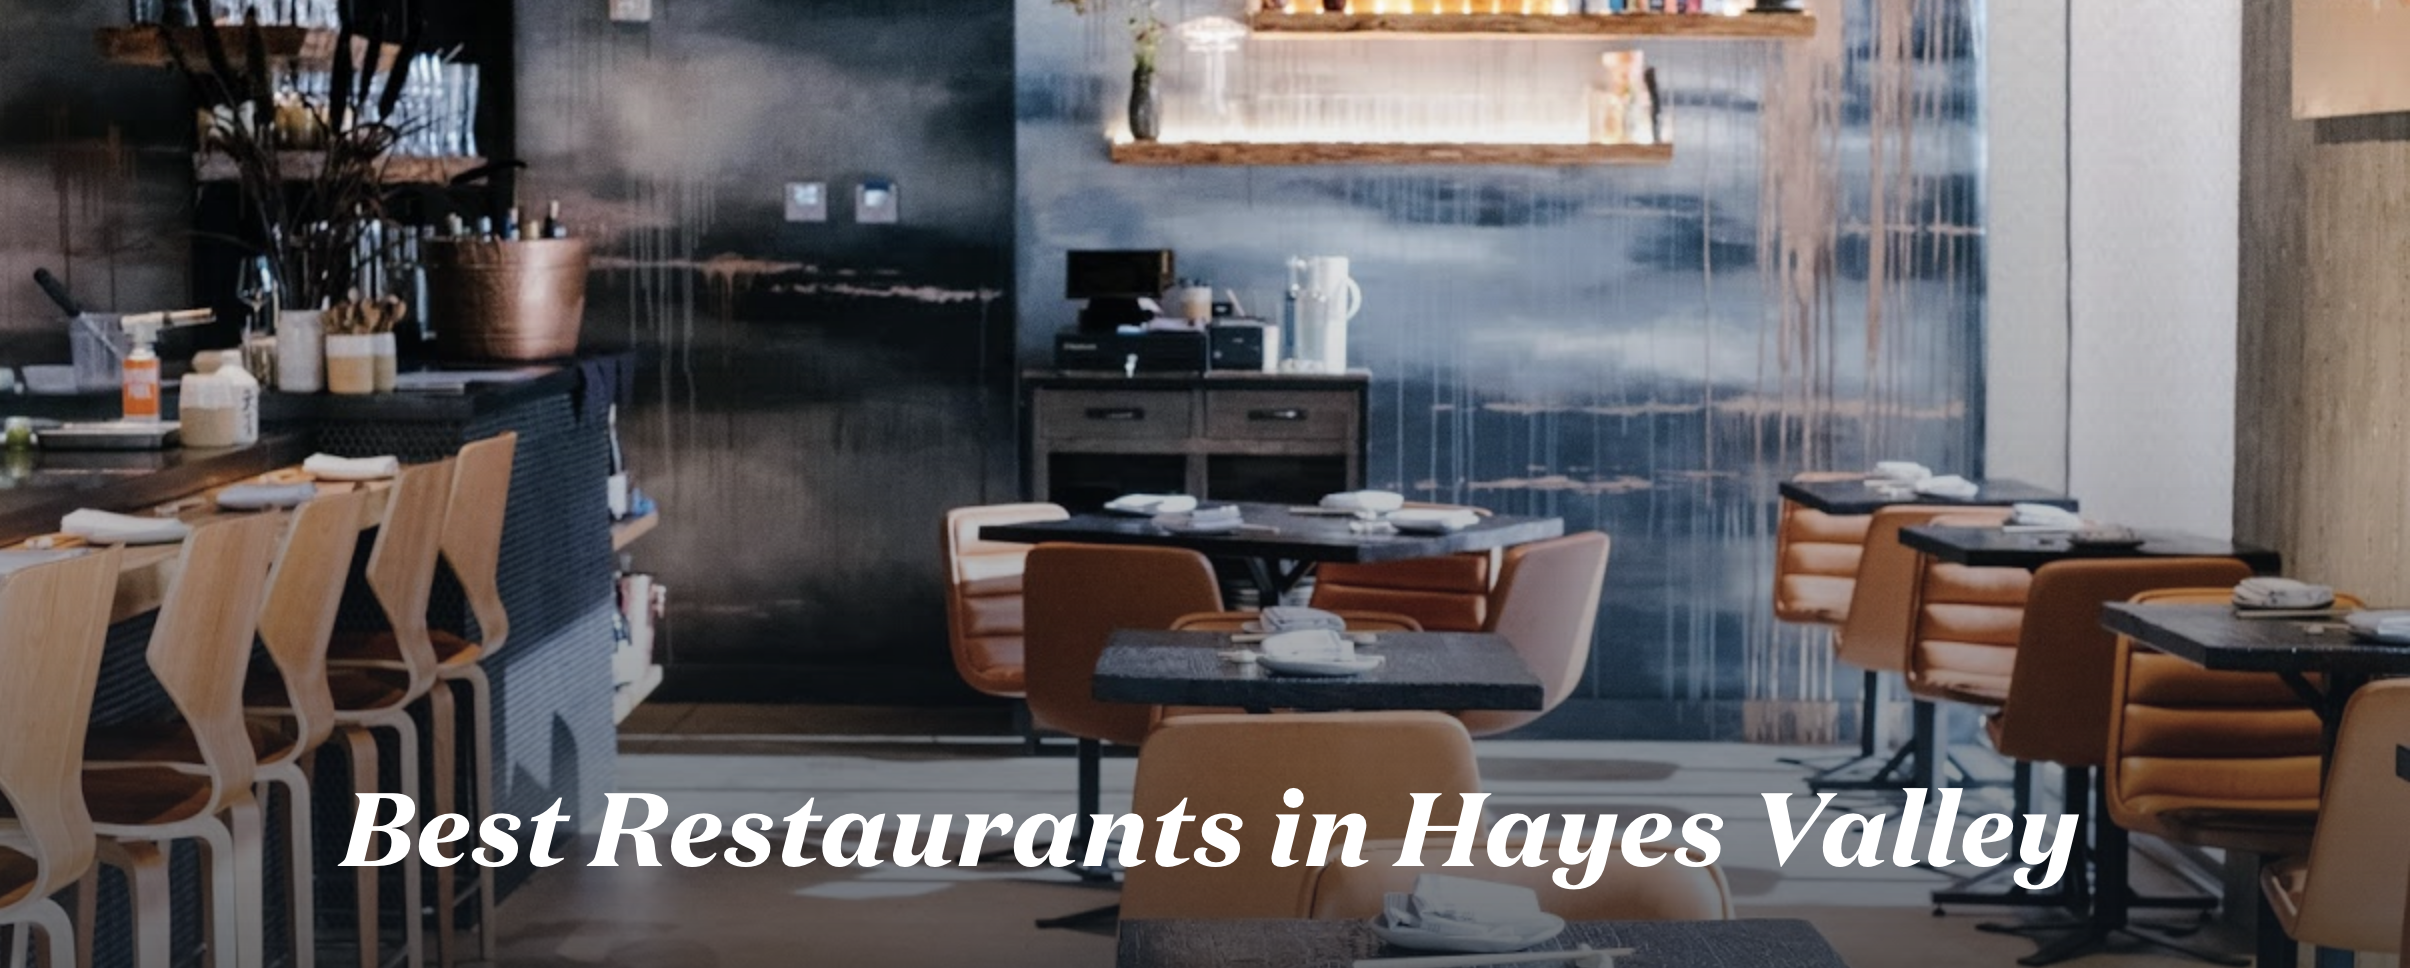 <b> ZAGAT </b> The Best Restaurants in Hayes Valley